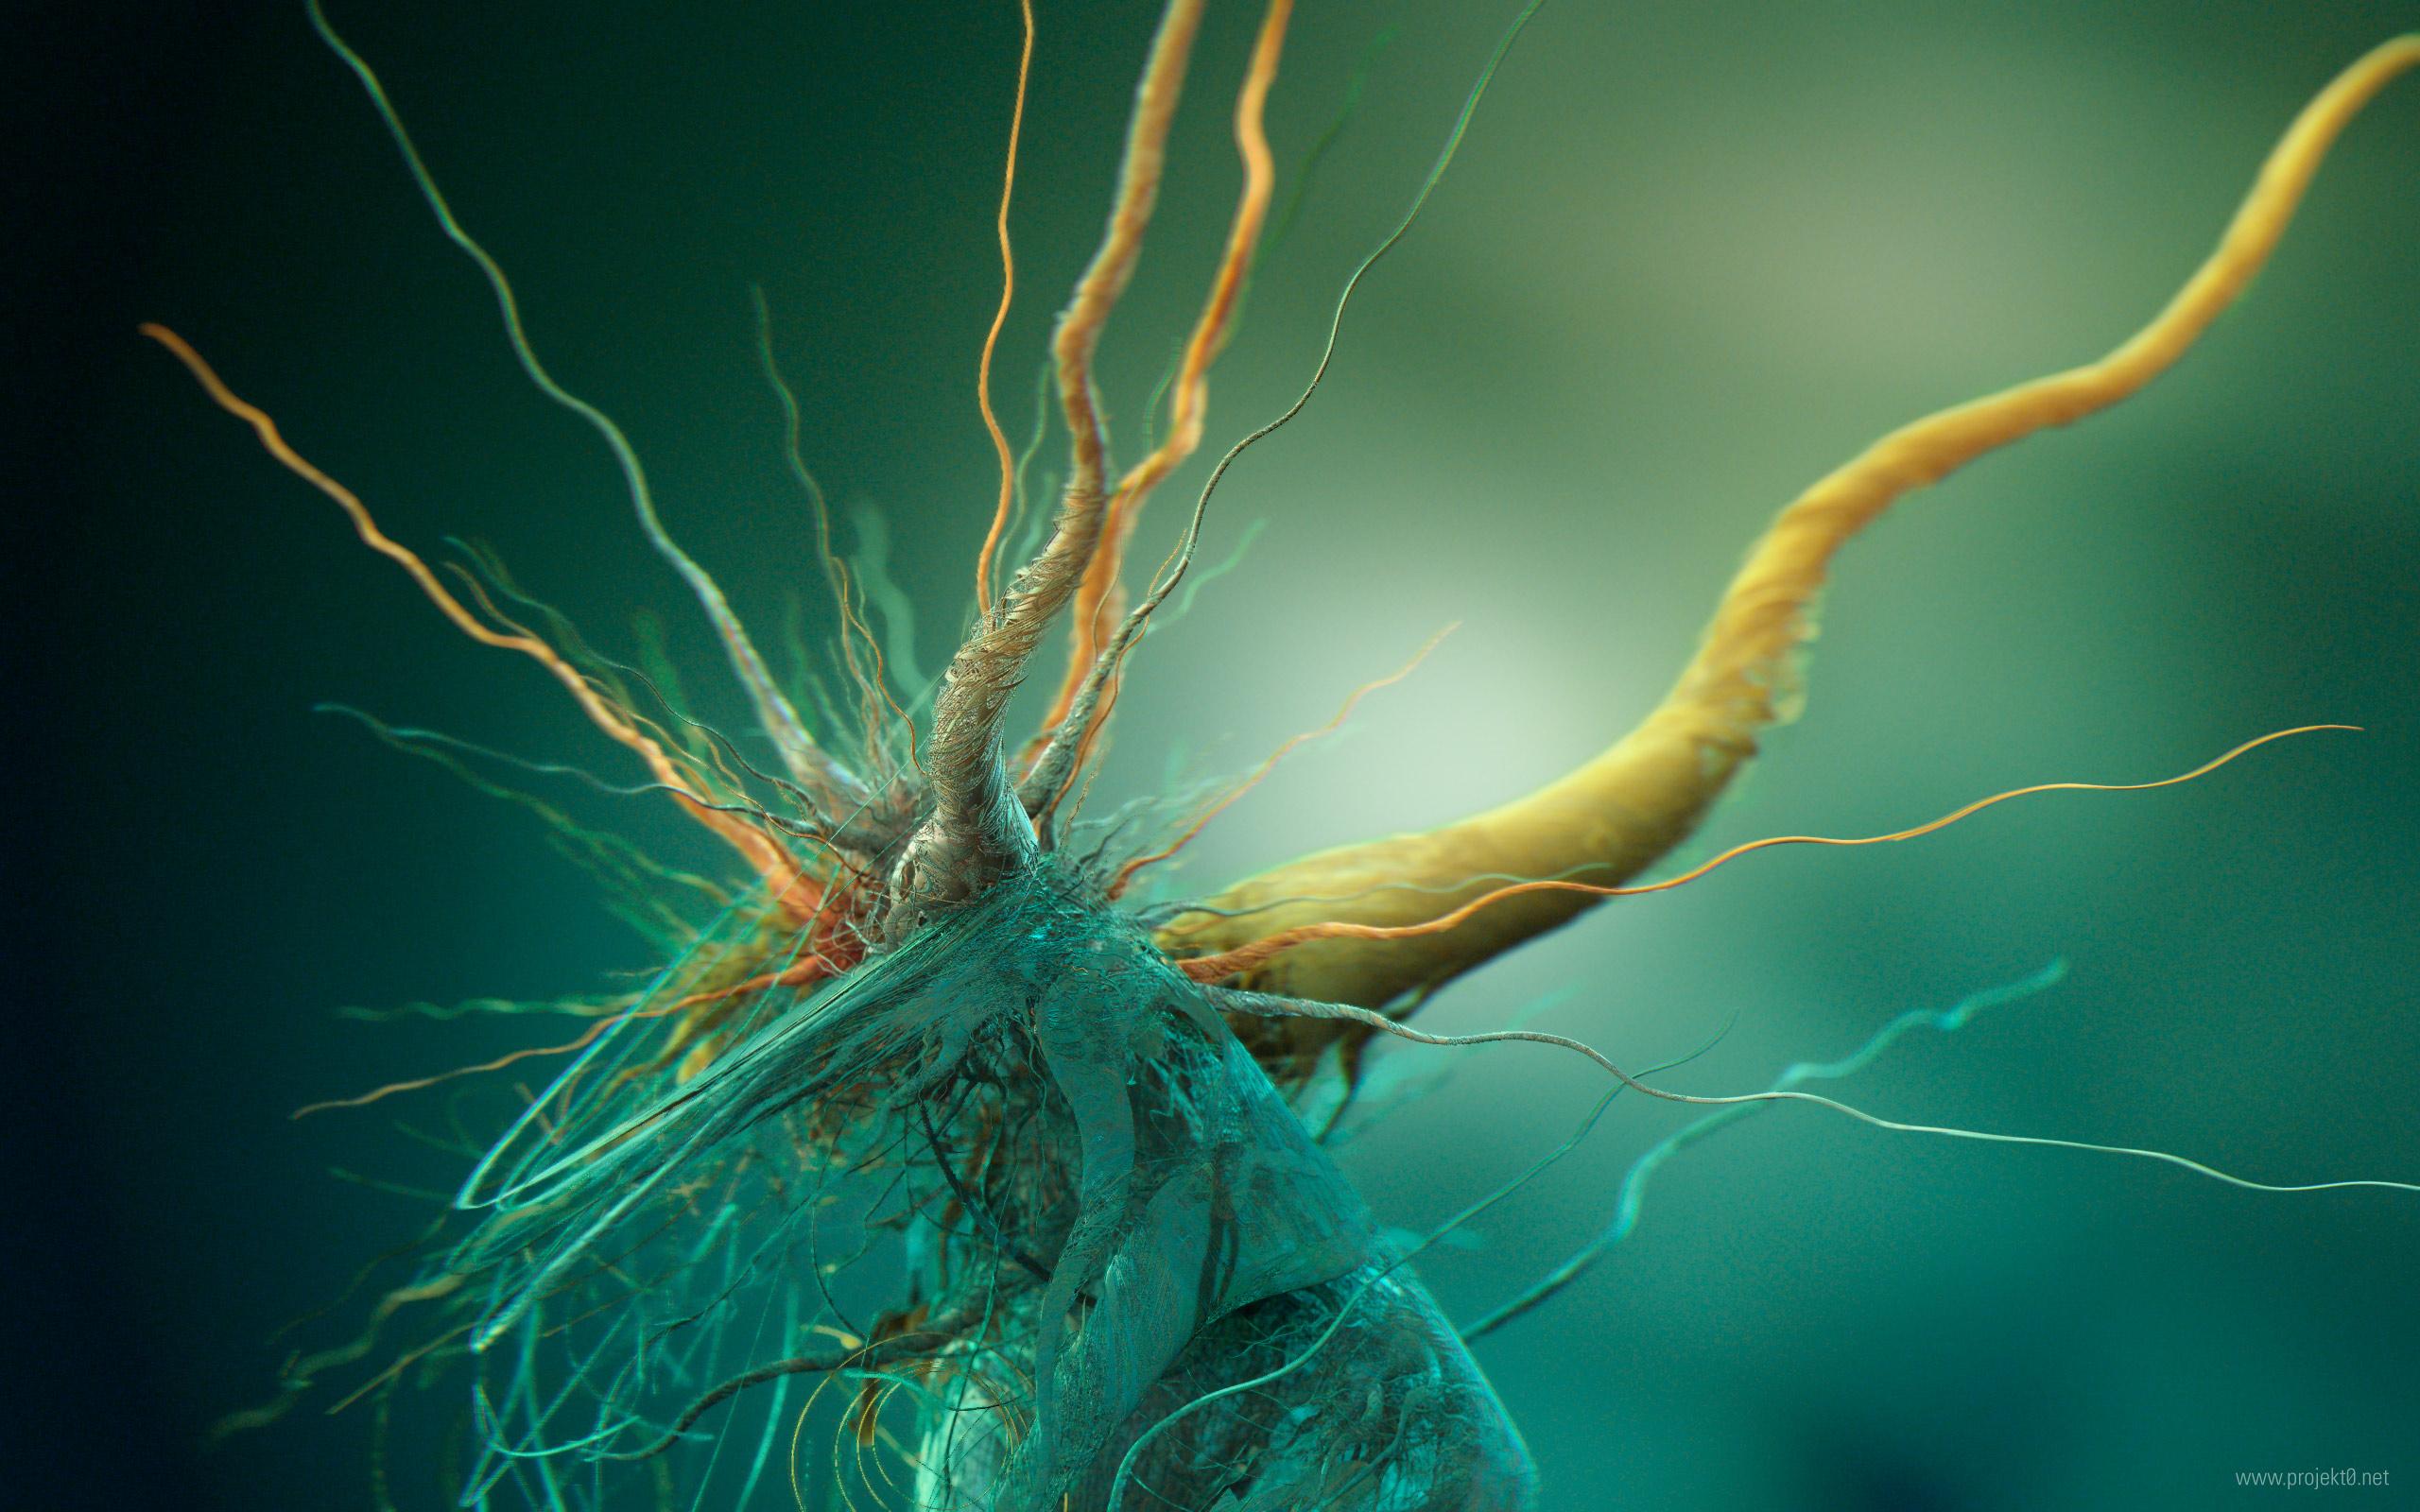 http://www.fascinatingly.com/wp-content/gallery/hd-star-wars-desktop-wallpaper/hd-wallpaper-art-bacteria.jpg